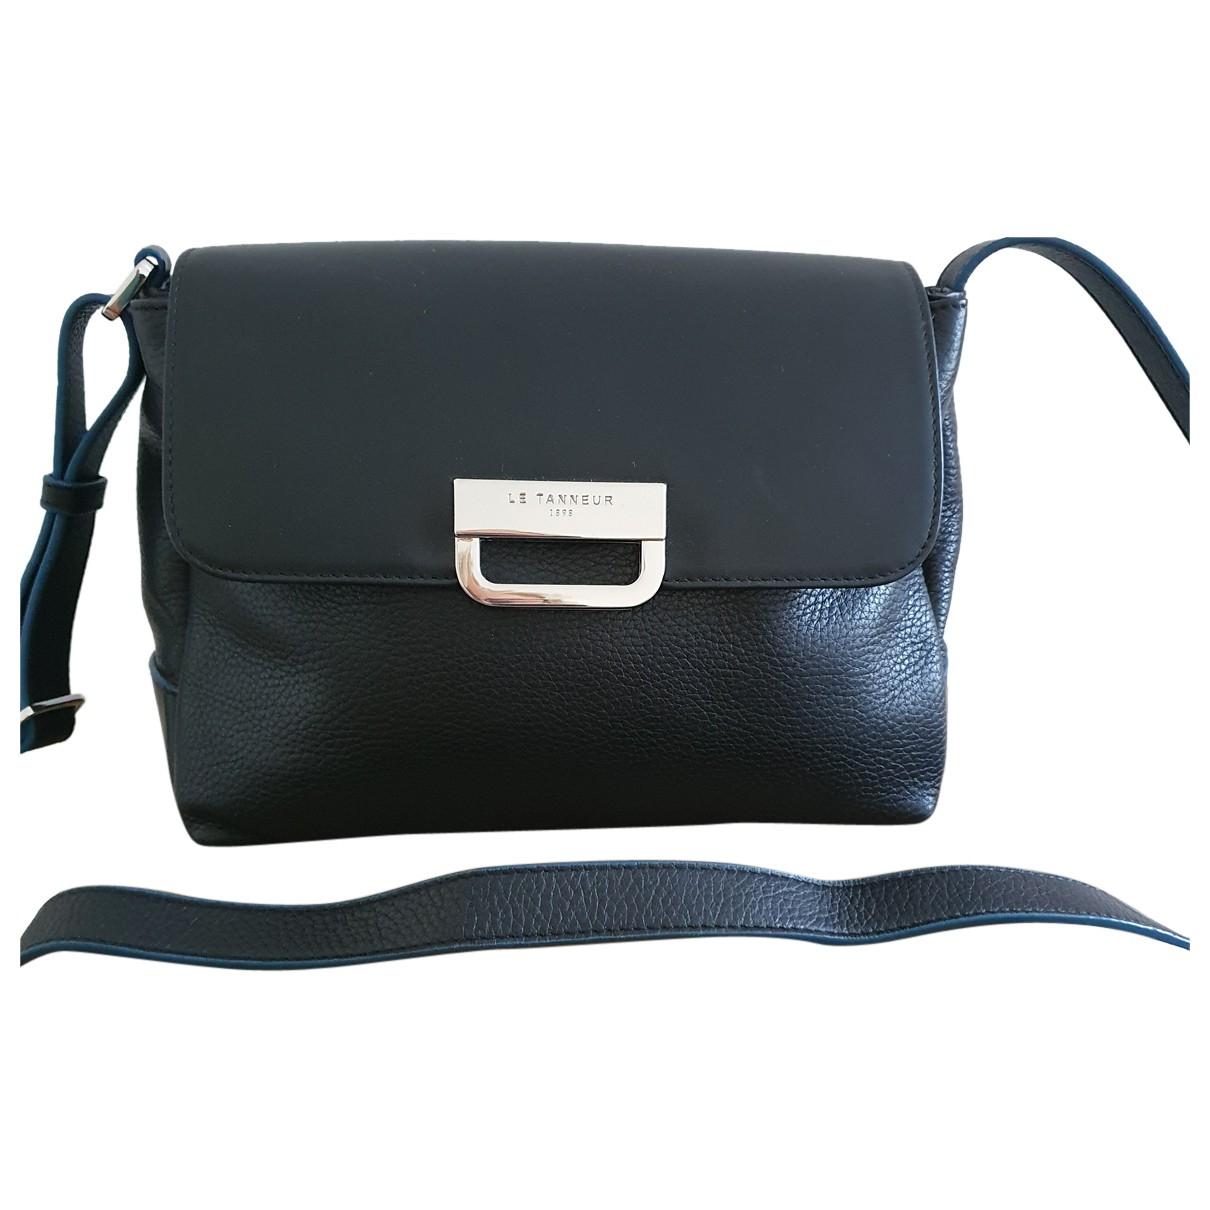 Le Tanneur N Navy Leather handbag for Women N